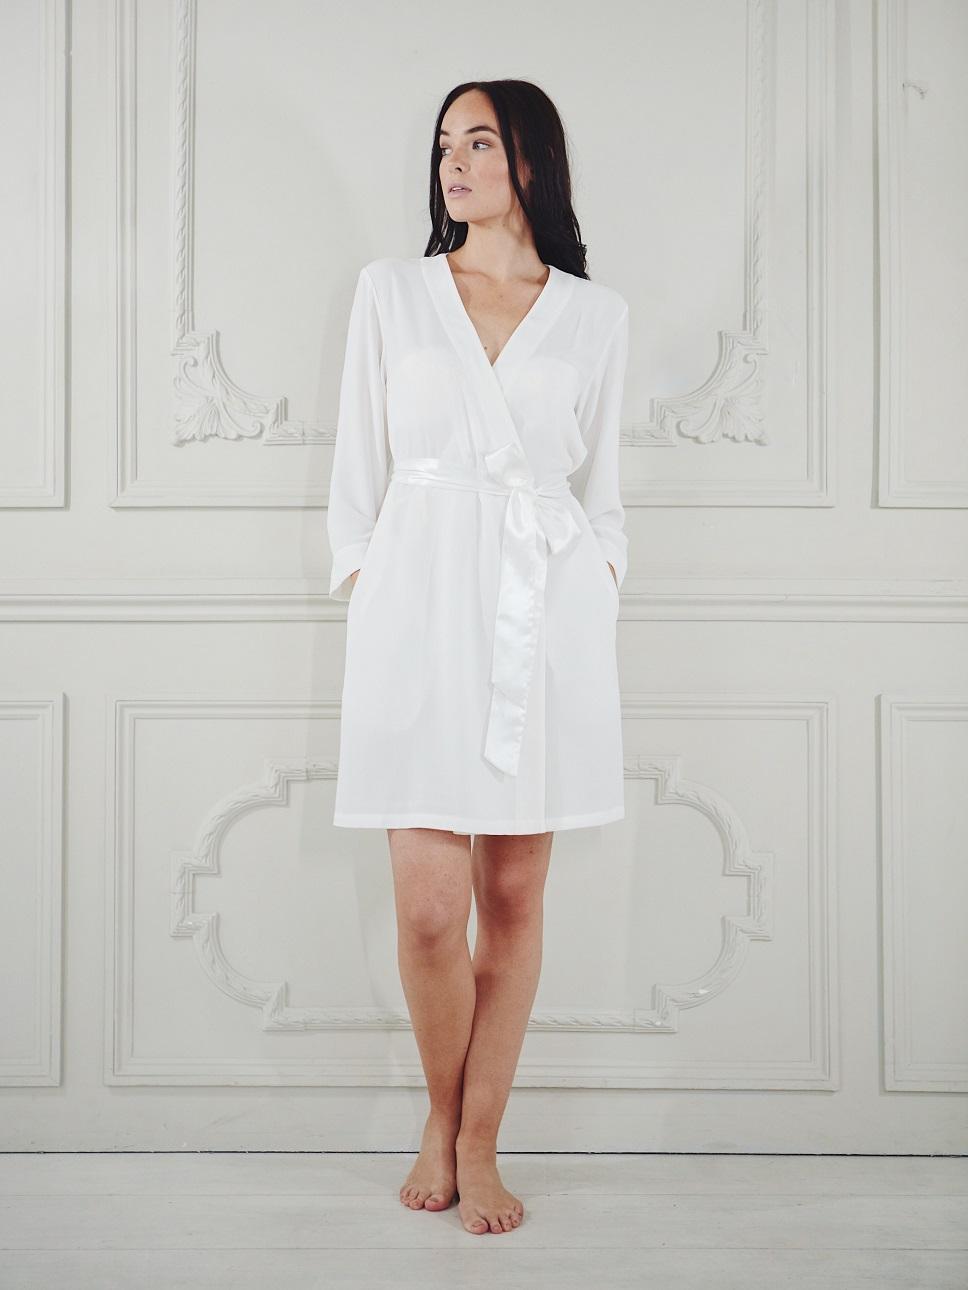 Luxury bridal robe in white